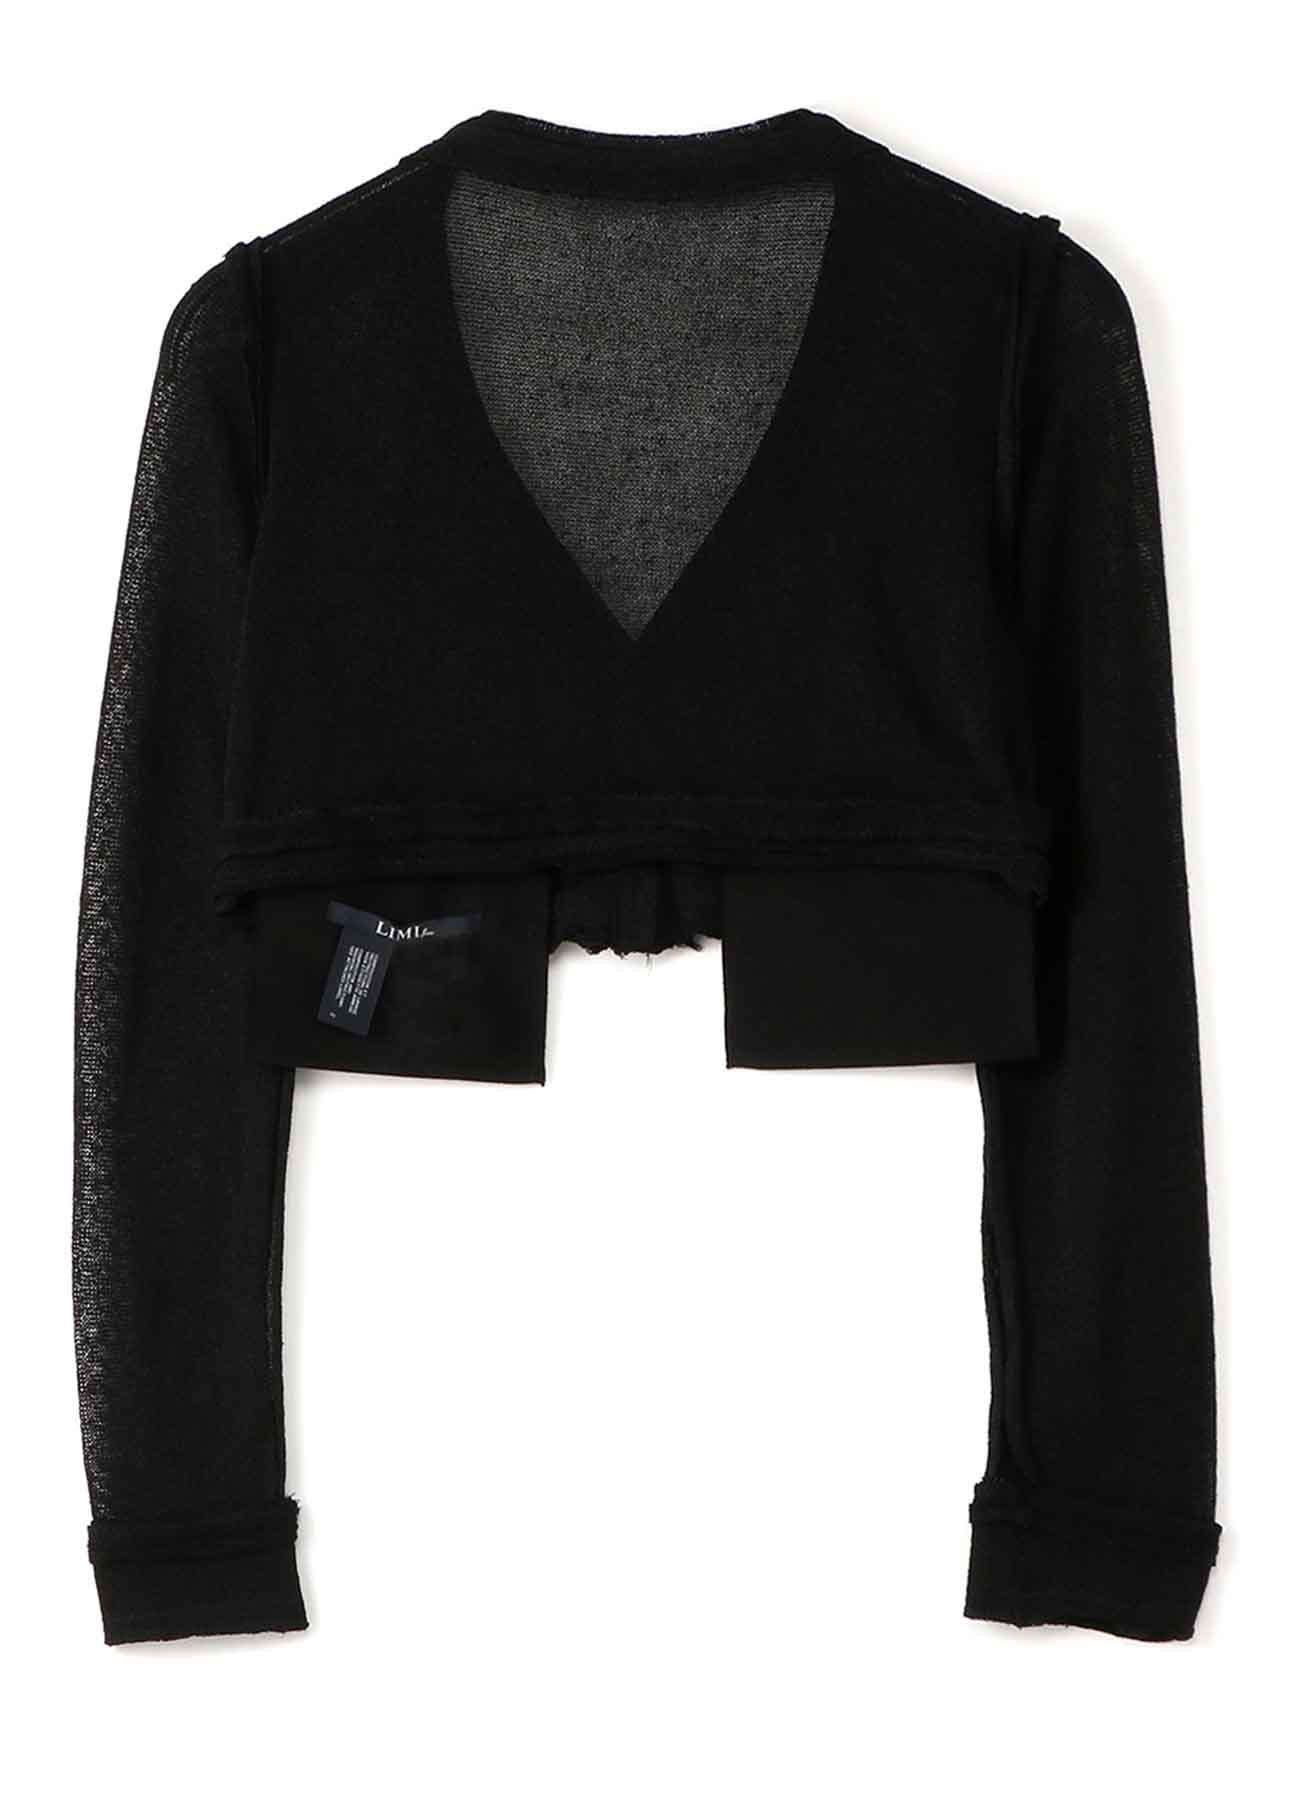 Li/Pe Knitted Plain Stitch Short Cardigan